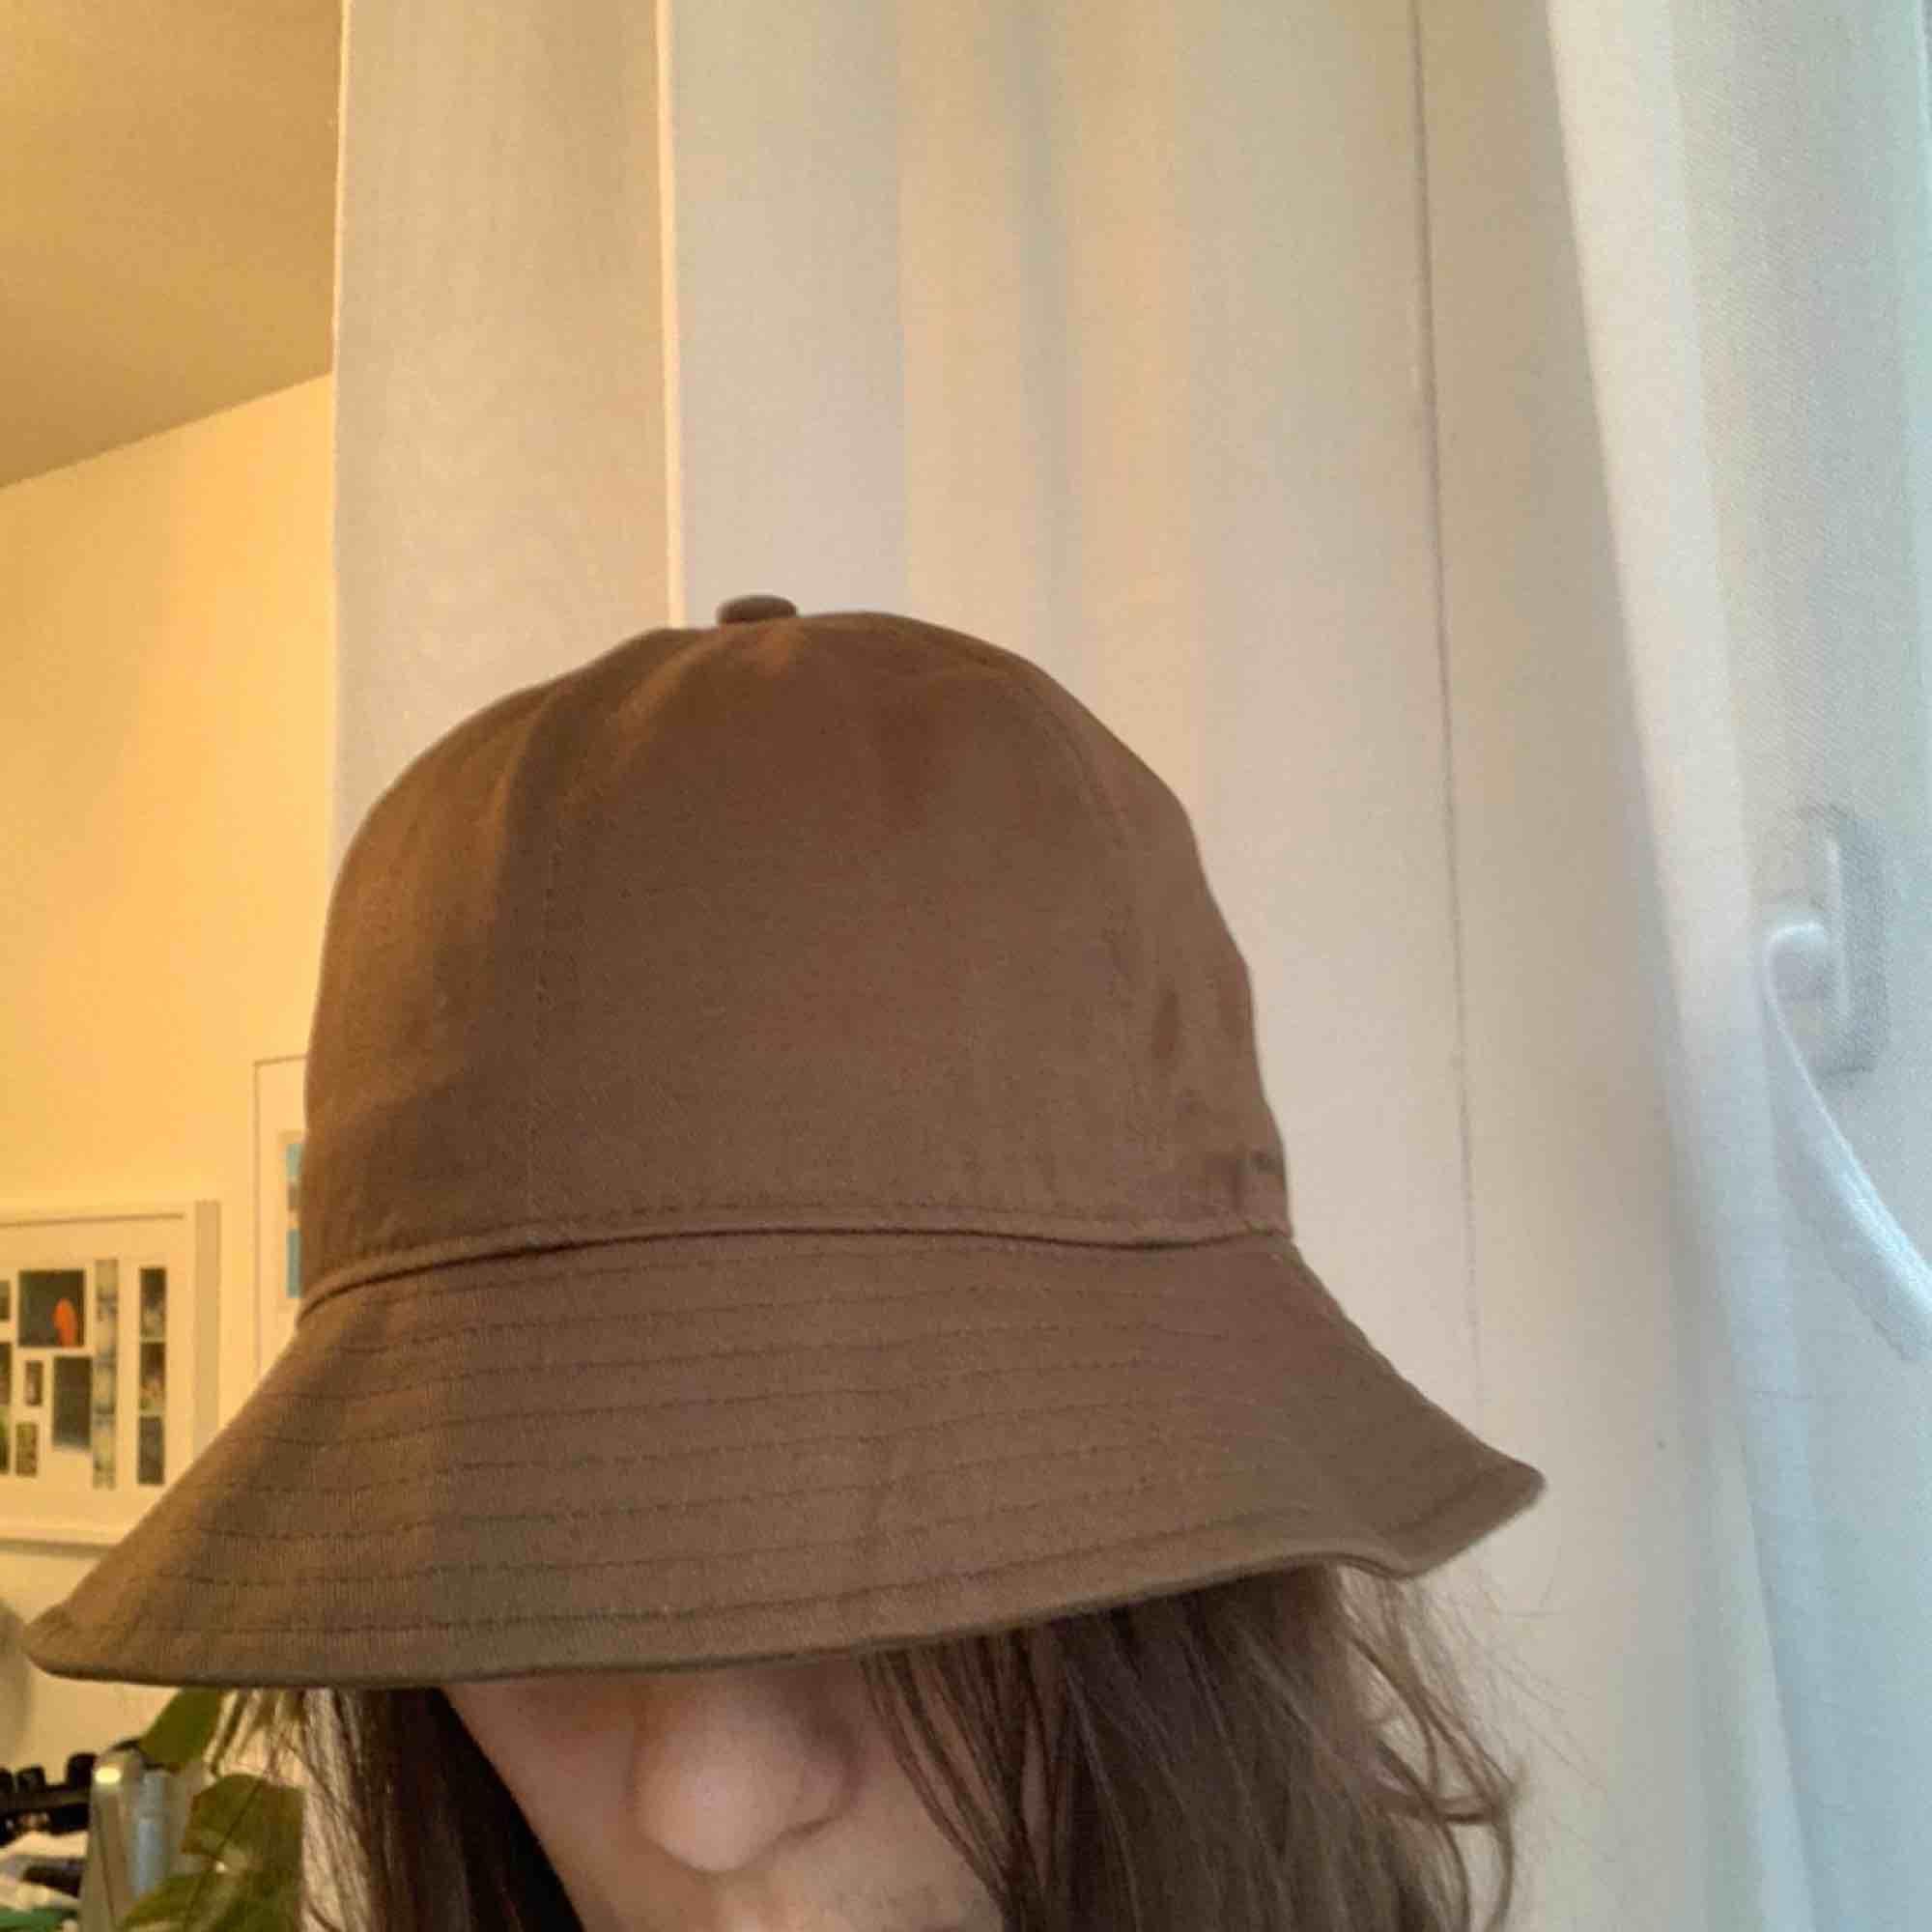 Brun bucket hatt. Accessoarer.